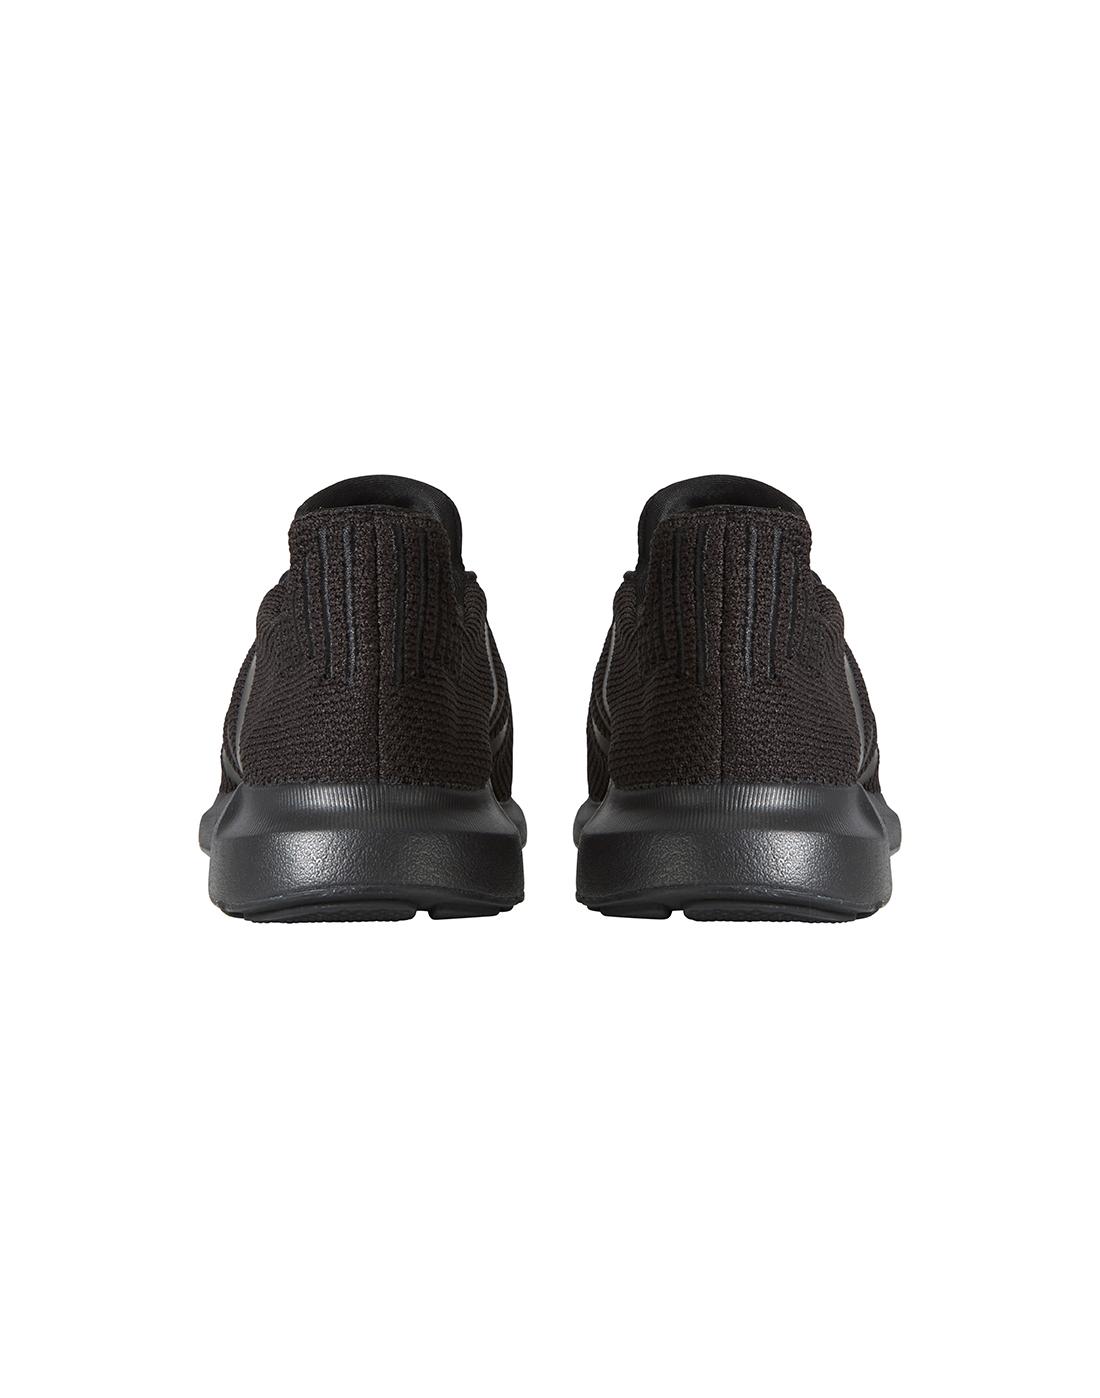 dbd3f6f9e adidas Originals Mens Swift Run